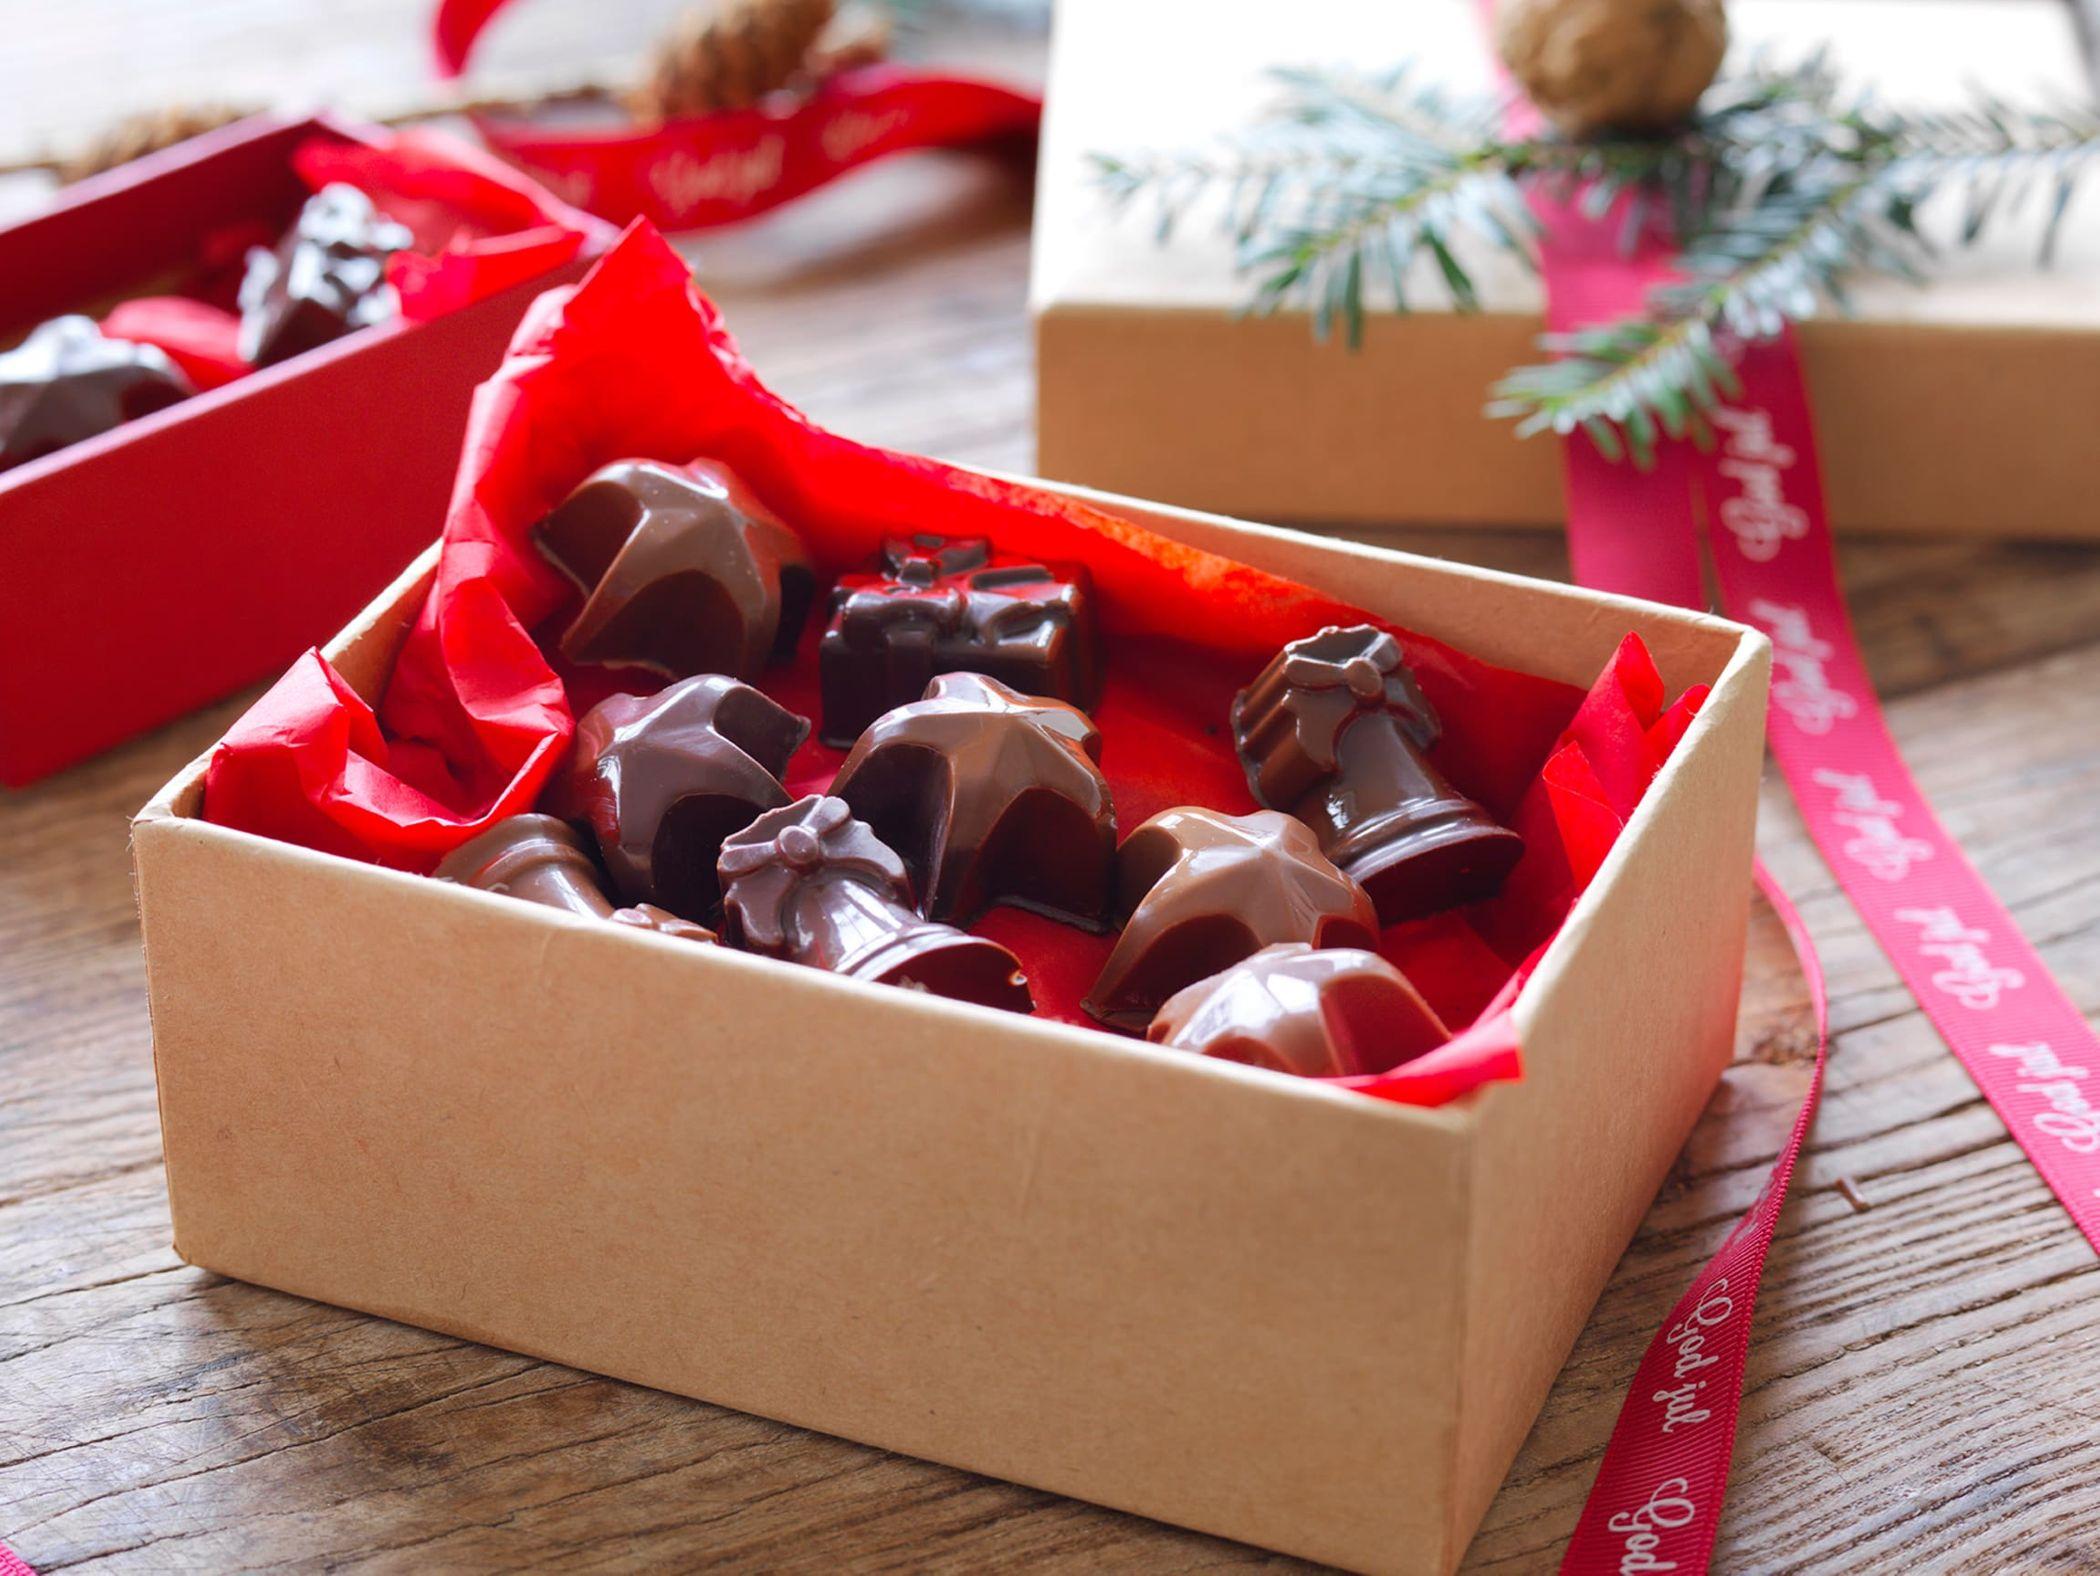 hjemmelaget-konfekt-og-sjokoladetrofler.jpeg